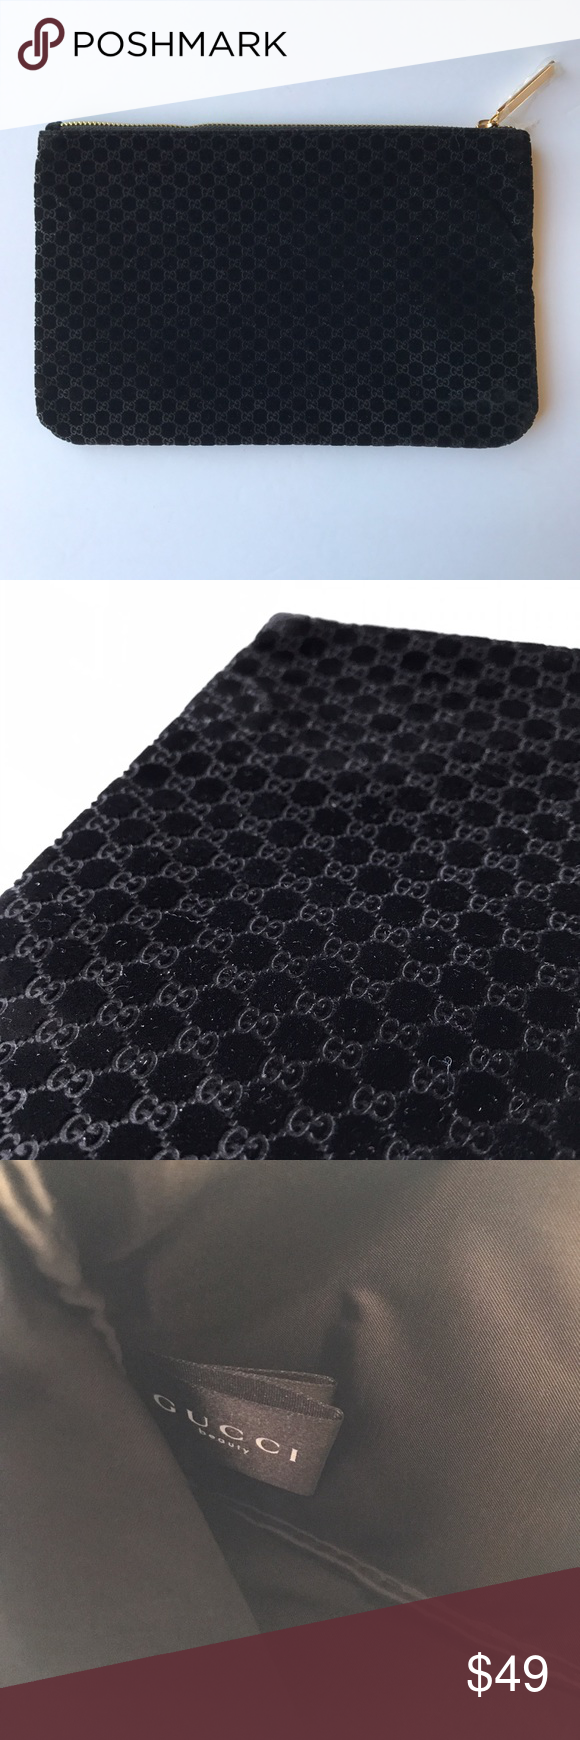 Gucci • black velvet makeup bag Elegant rectangular